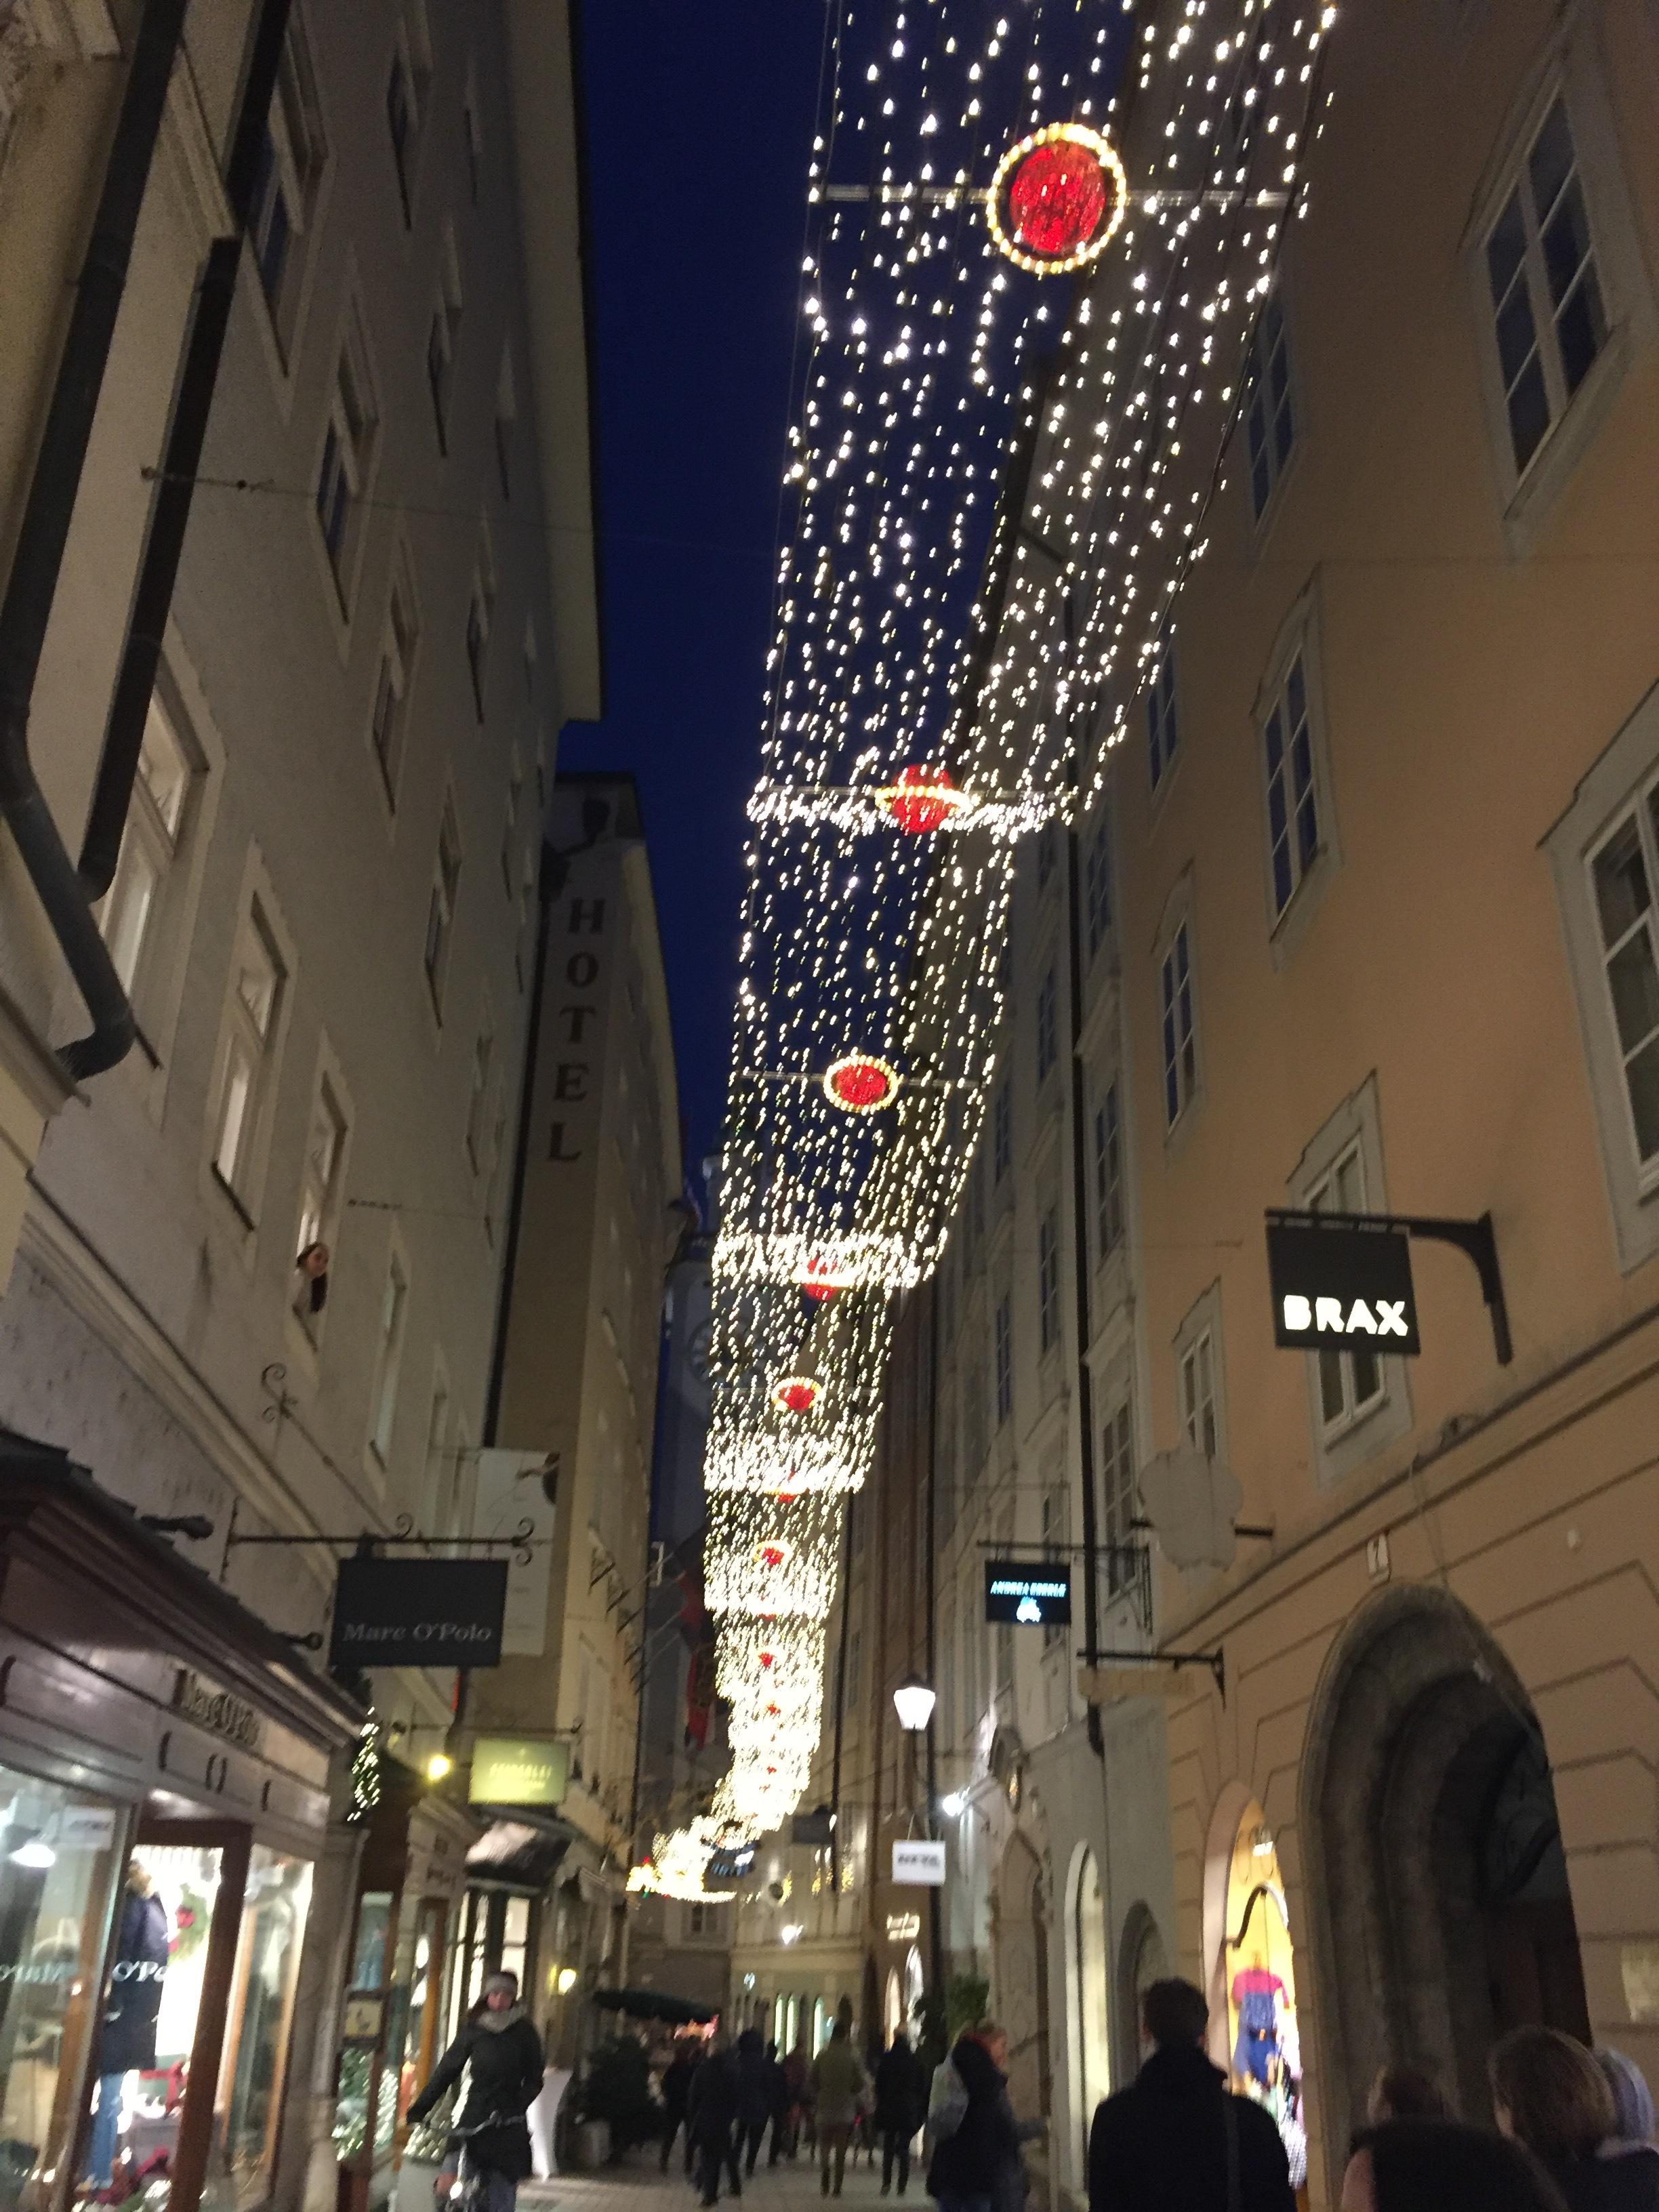 The Christkindlmarkets in Salzburg, Austria are breath-taking - November 2017